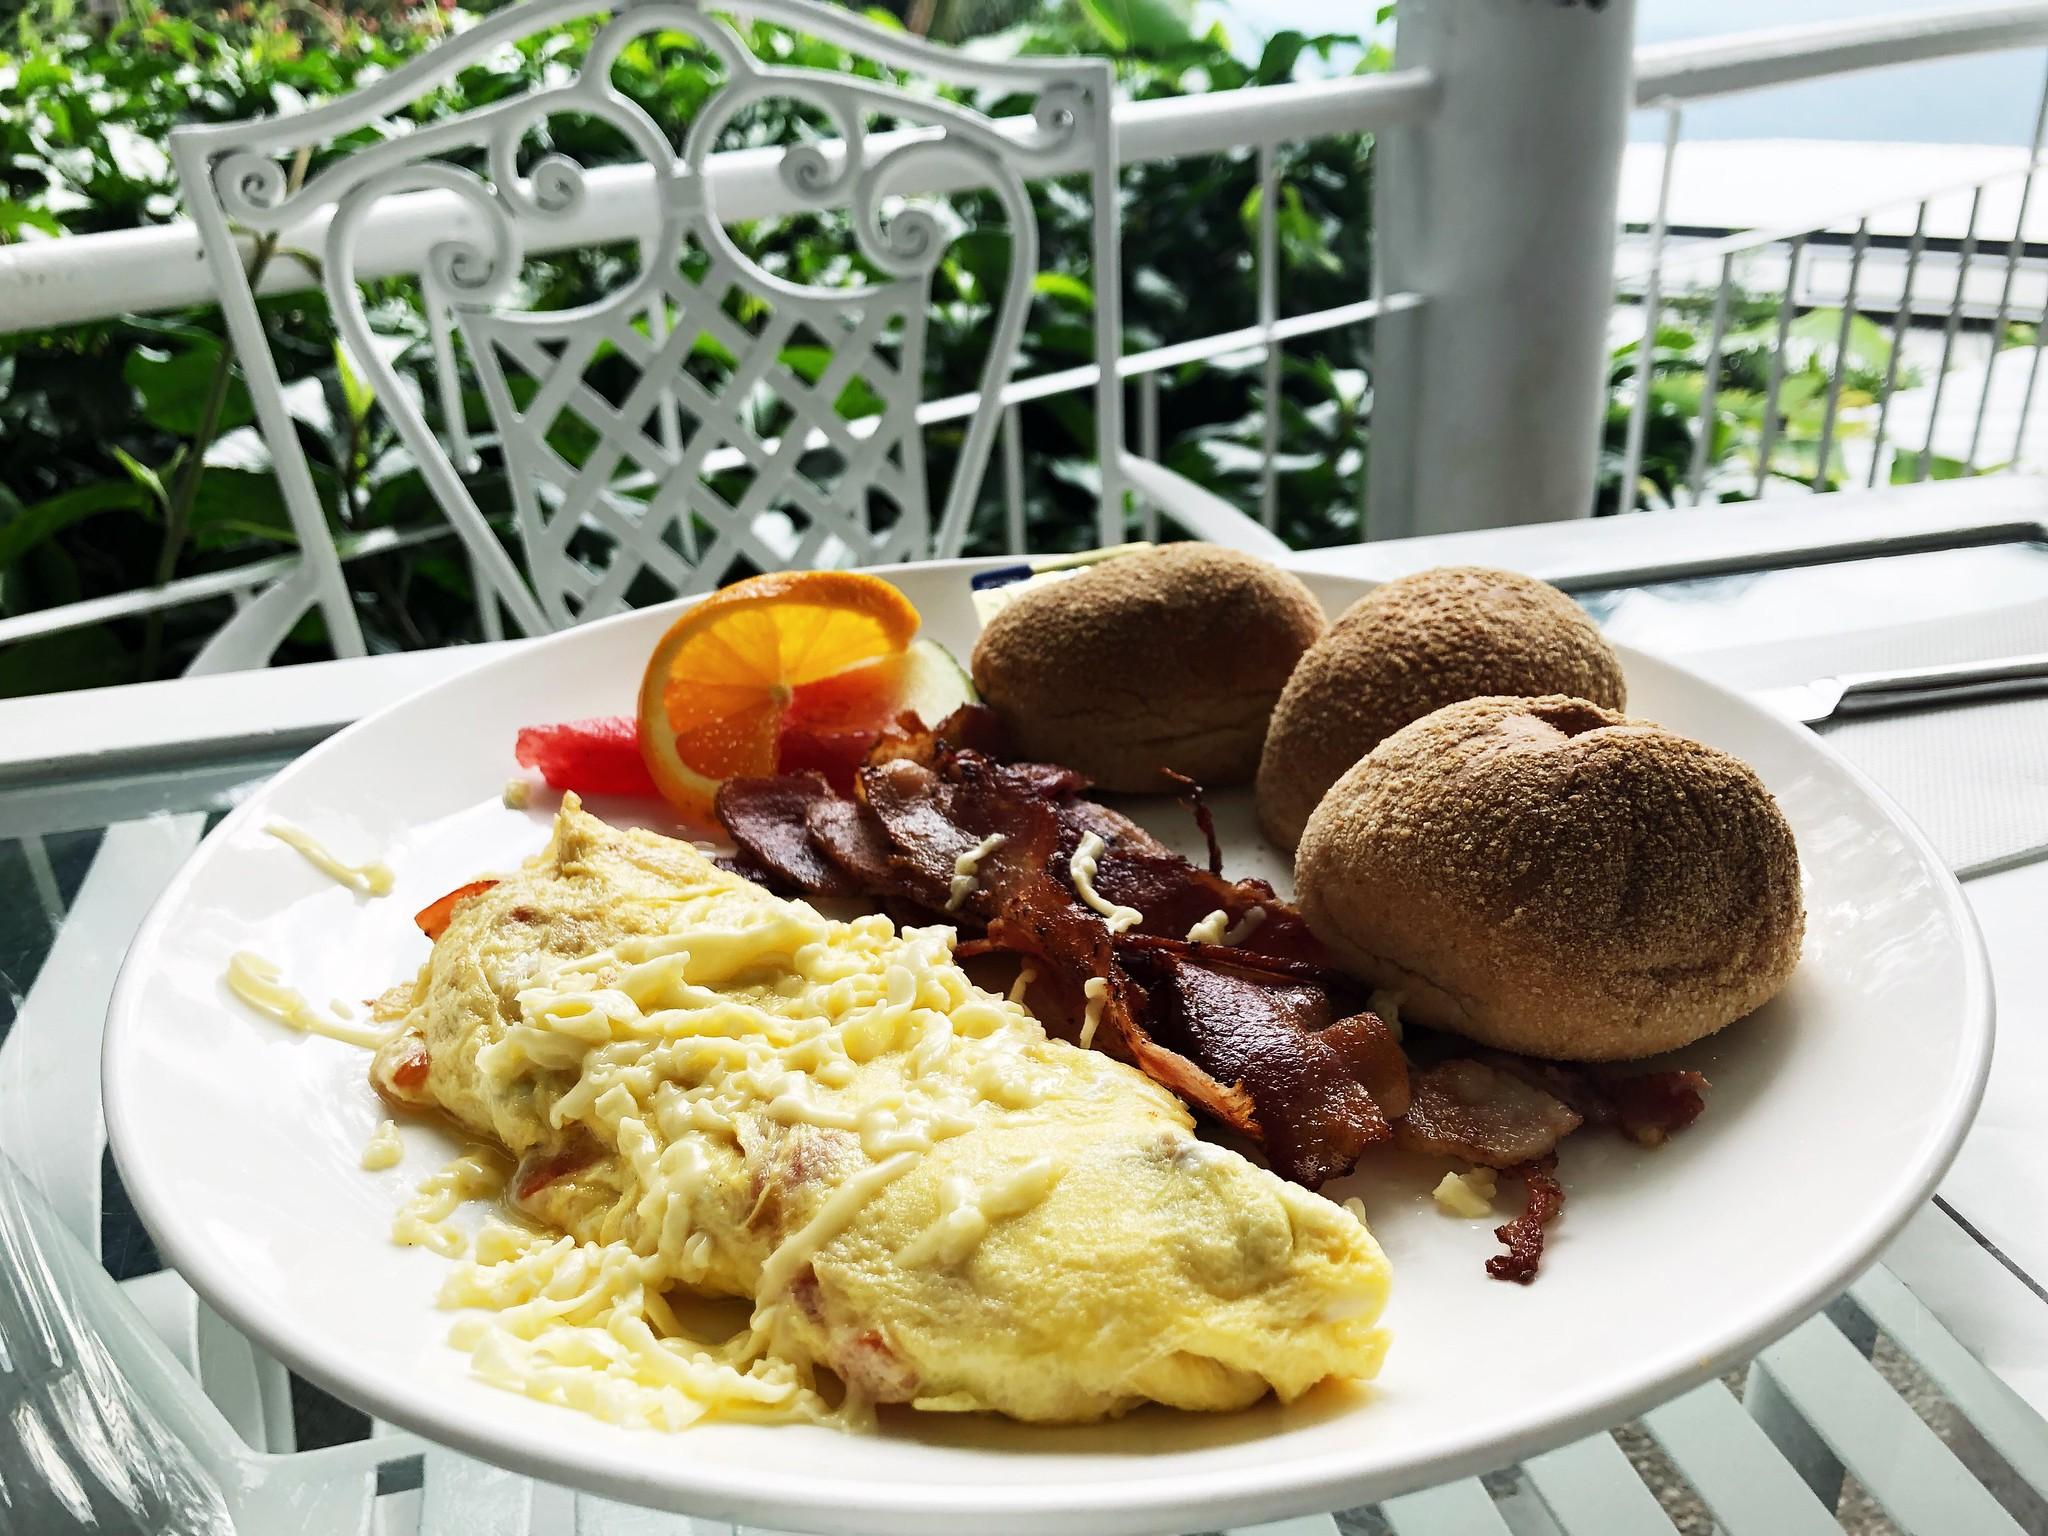 Cẩm nang ăn uống ở Tagaytay - eggs and cheese omellete